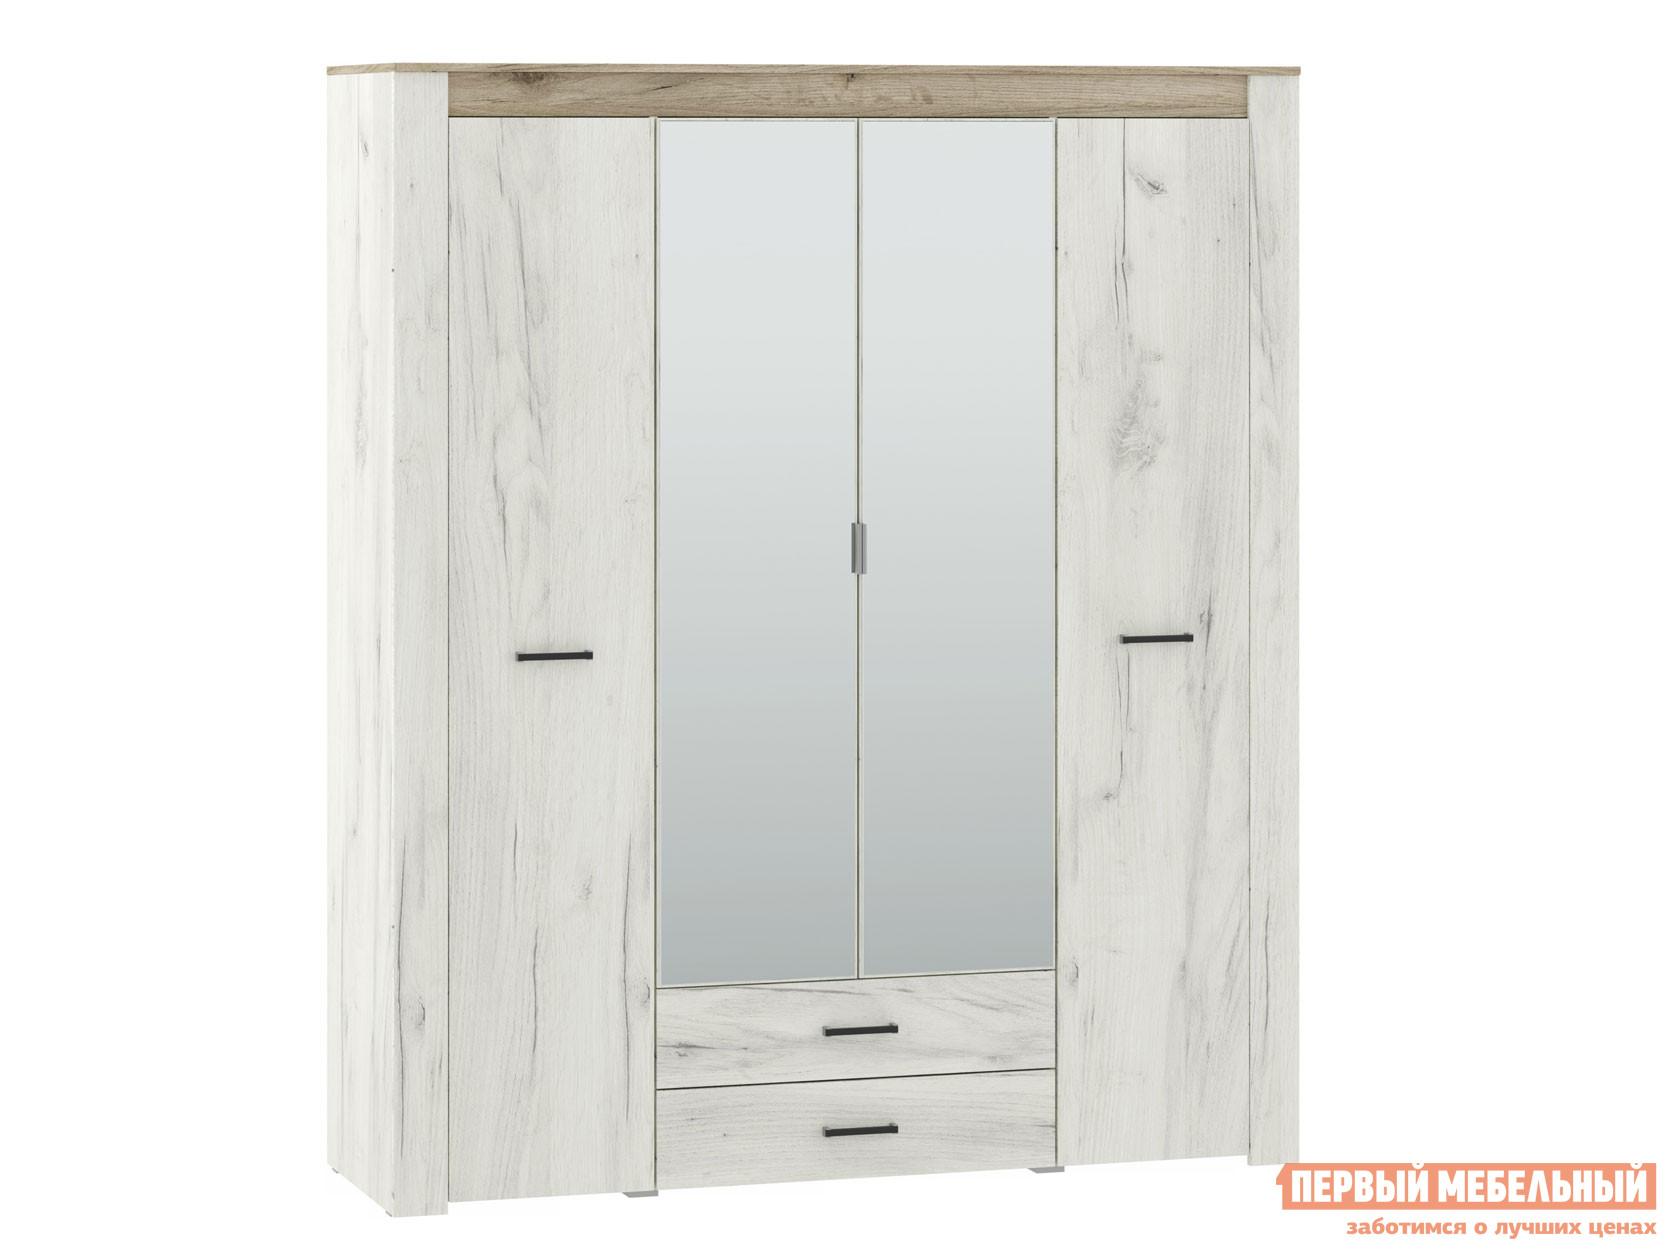 Шкаф распашной НК-Мебель ПРАГА шкаф 4-х дверный 72030103 шкаф распашной нк мебель прага шкаф 4 х дверный 72030103